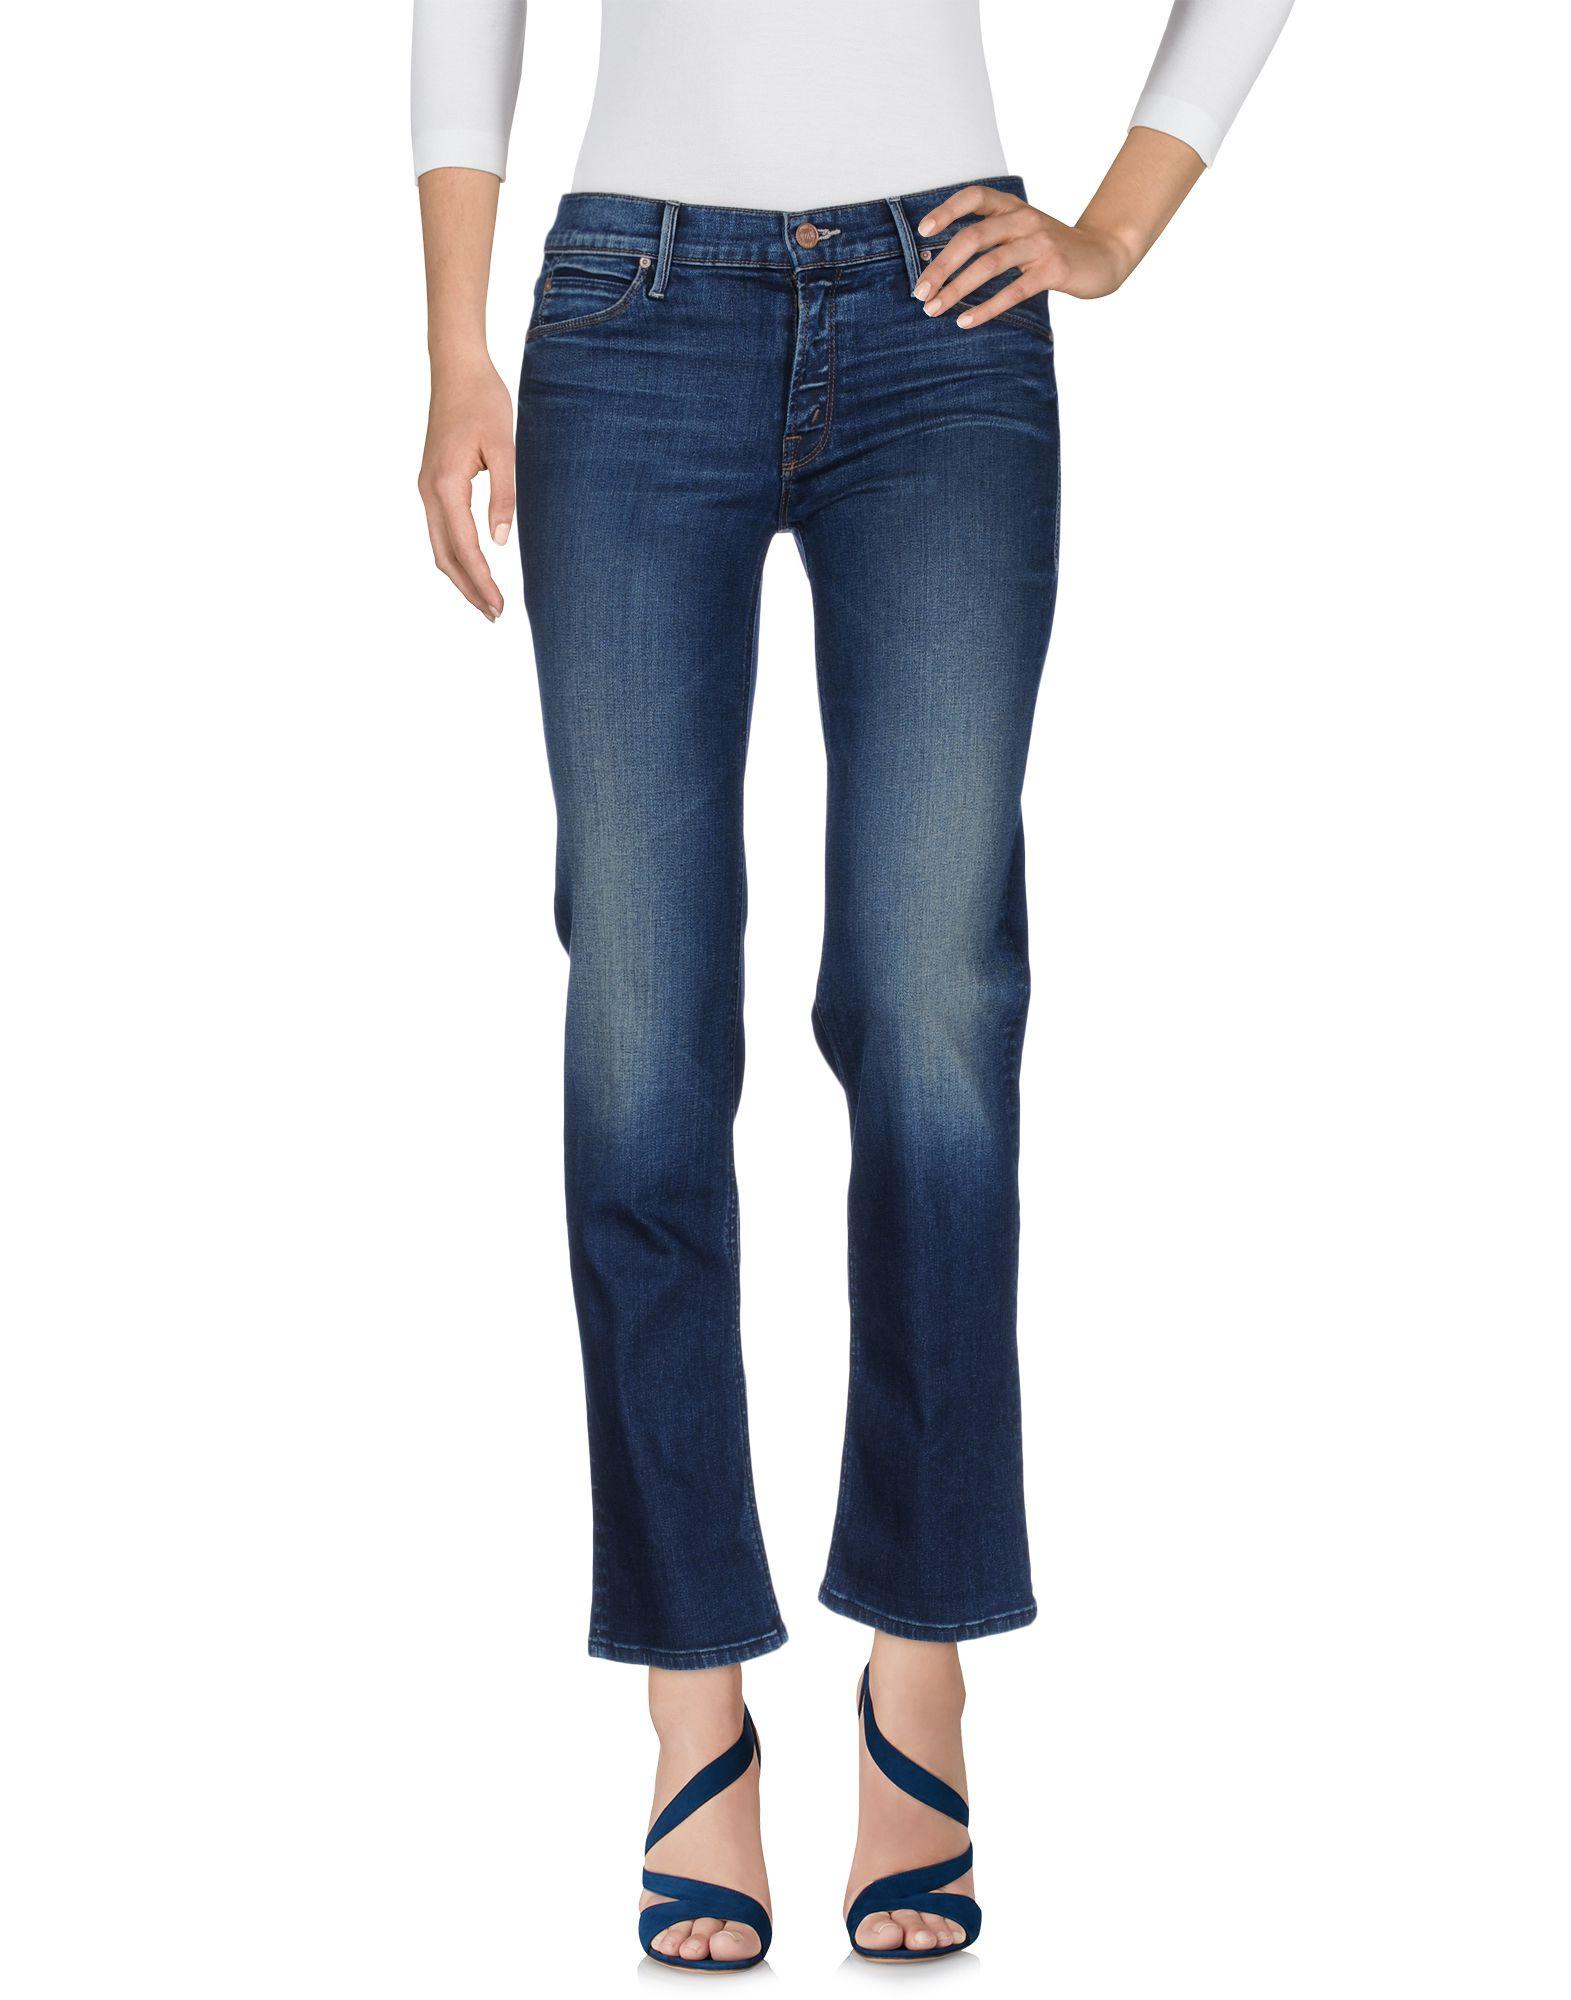 MOTHER Damen Jeanshose Farbe Blau Größe 7